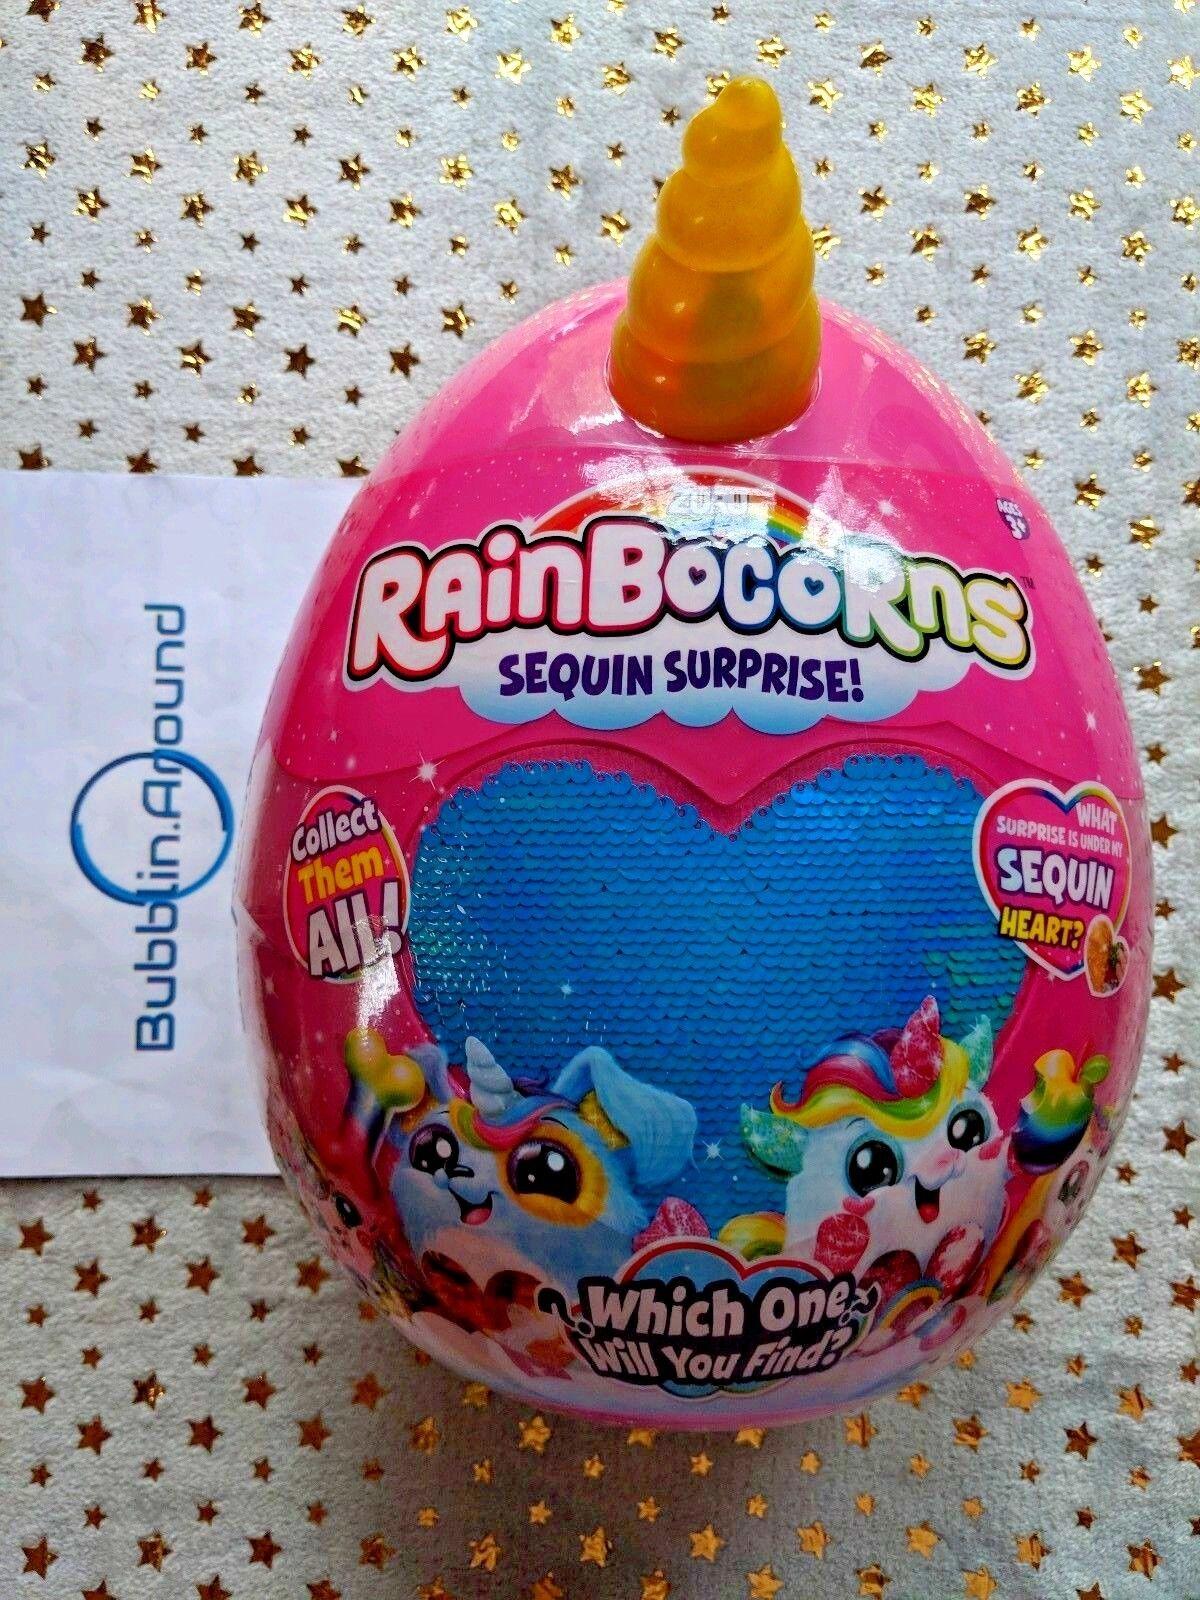 Rainbocorns Sequin Surprise - Melody - Hot Rosa Monkey Rainbocorn